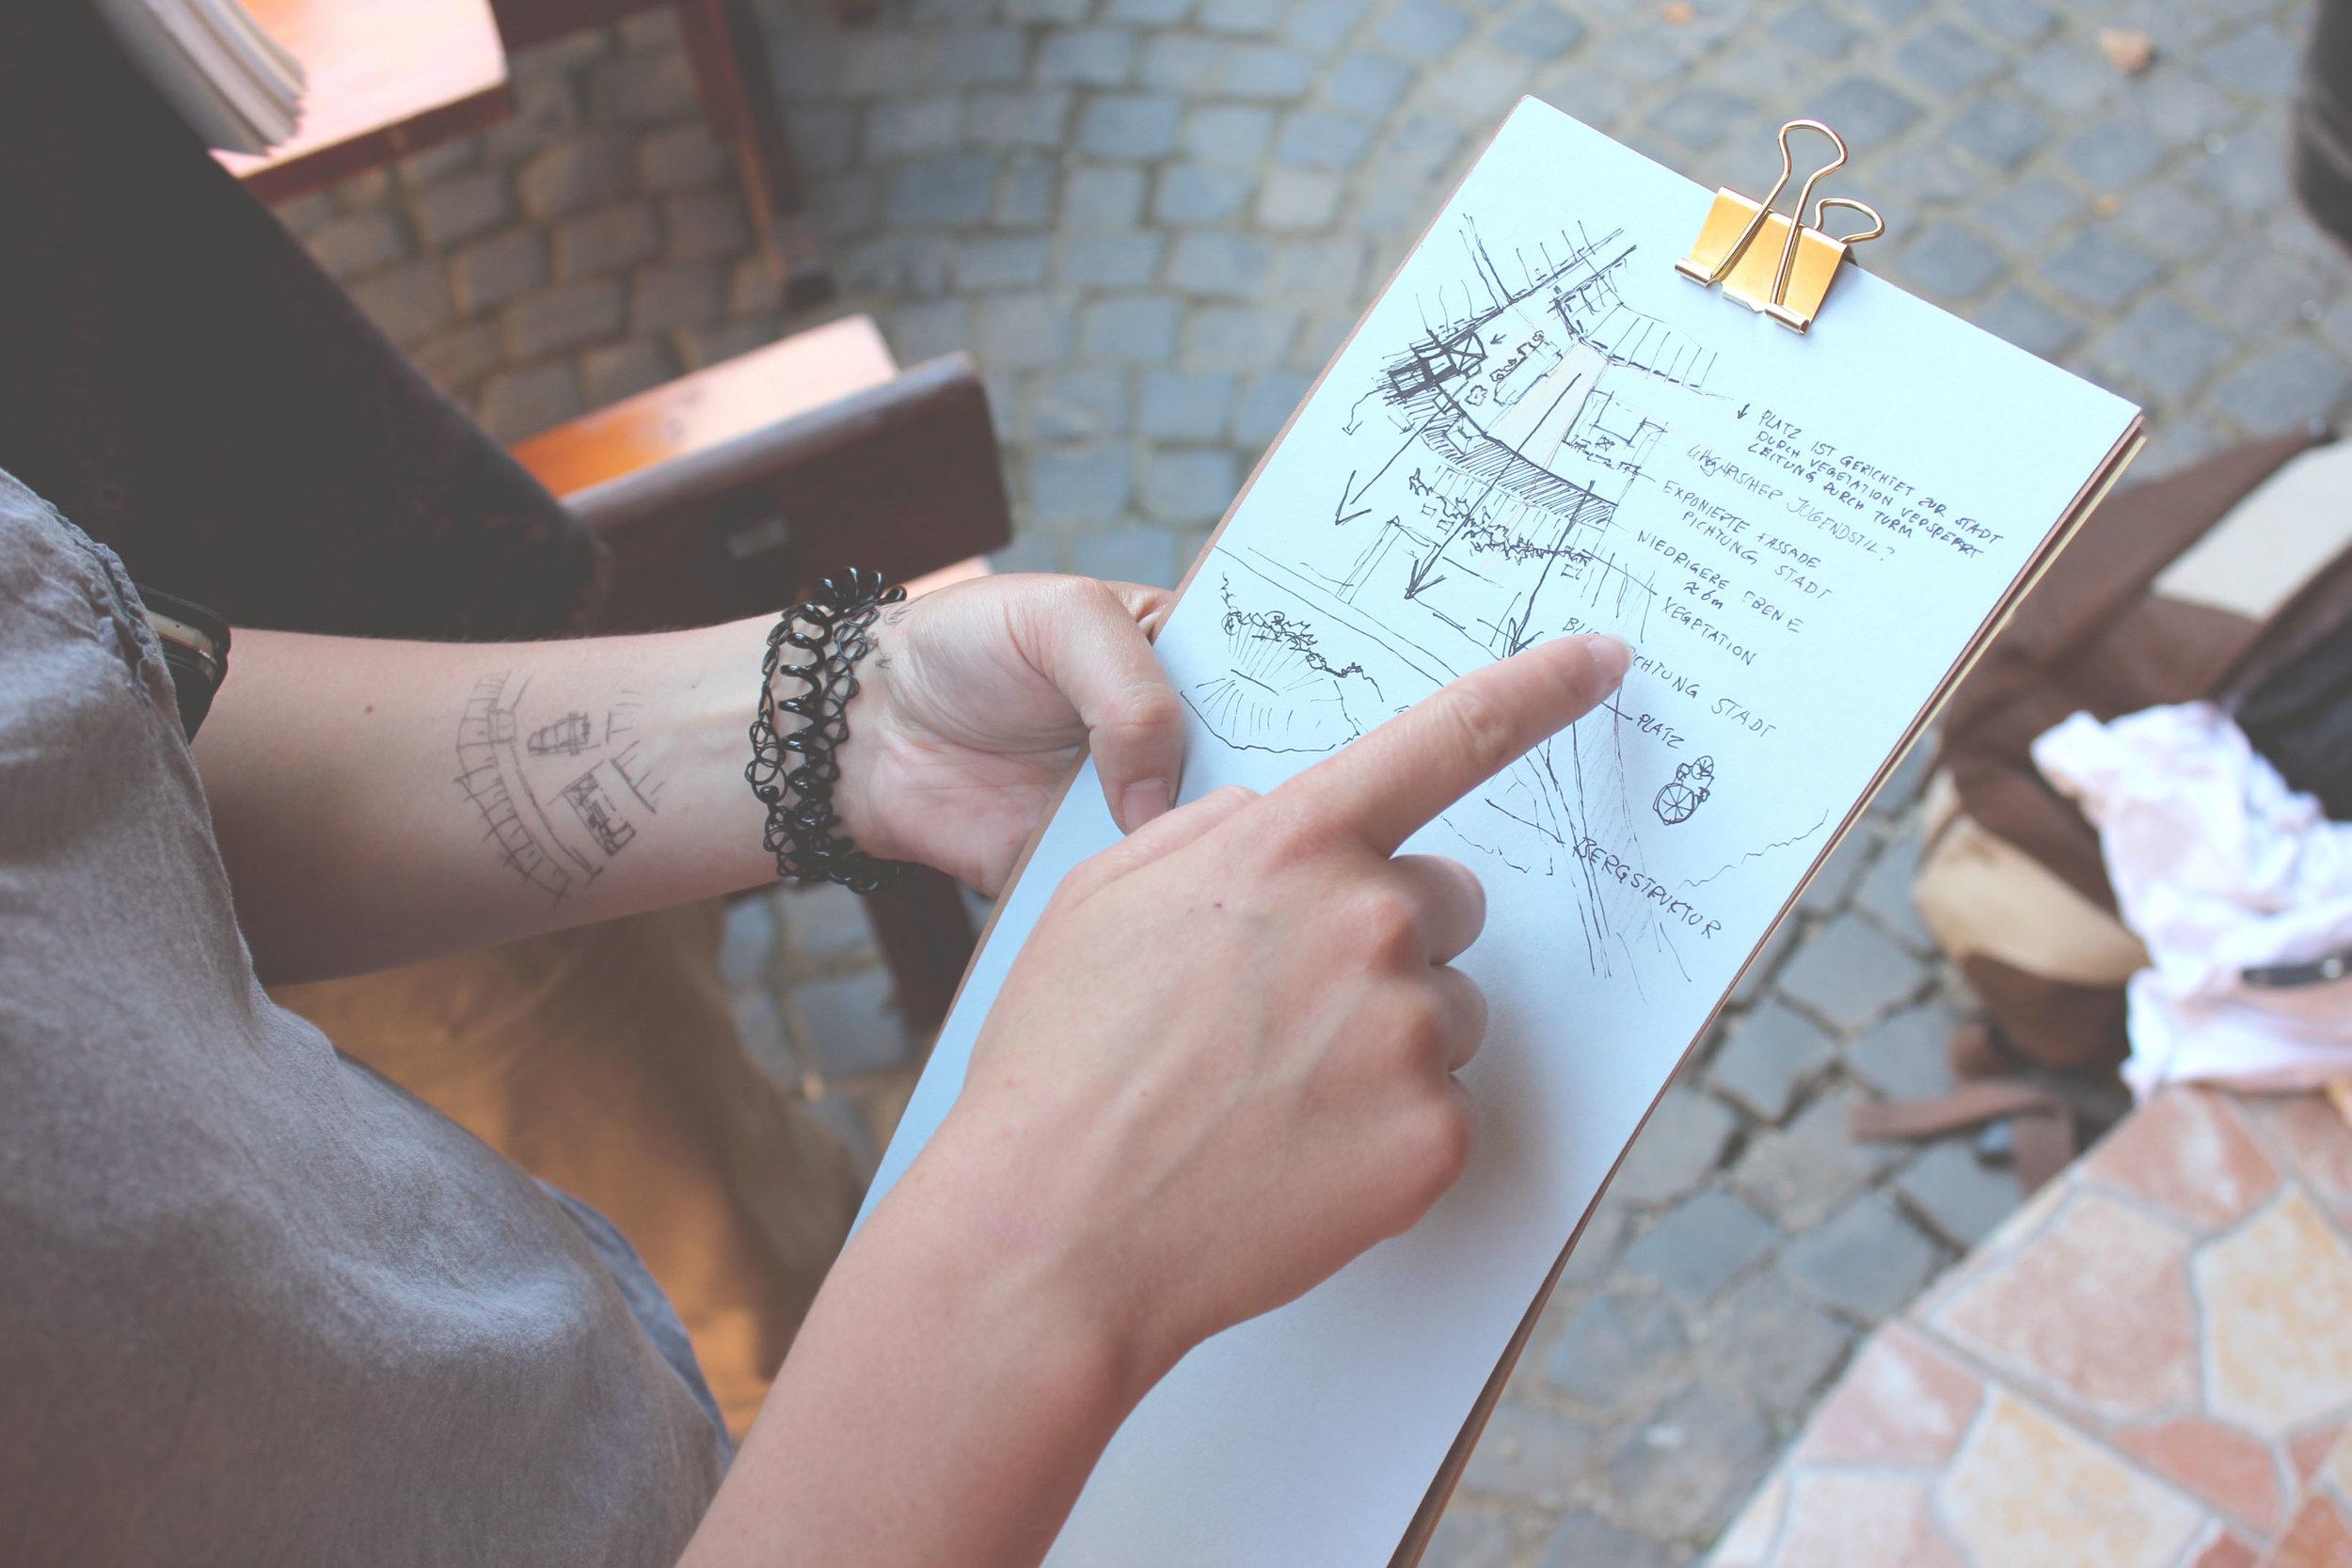 Skizze als Hilfsmittel